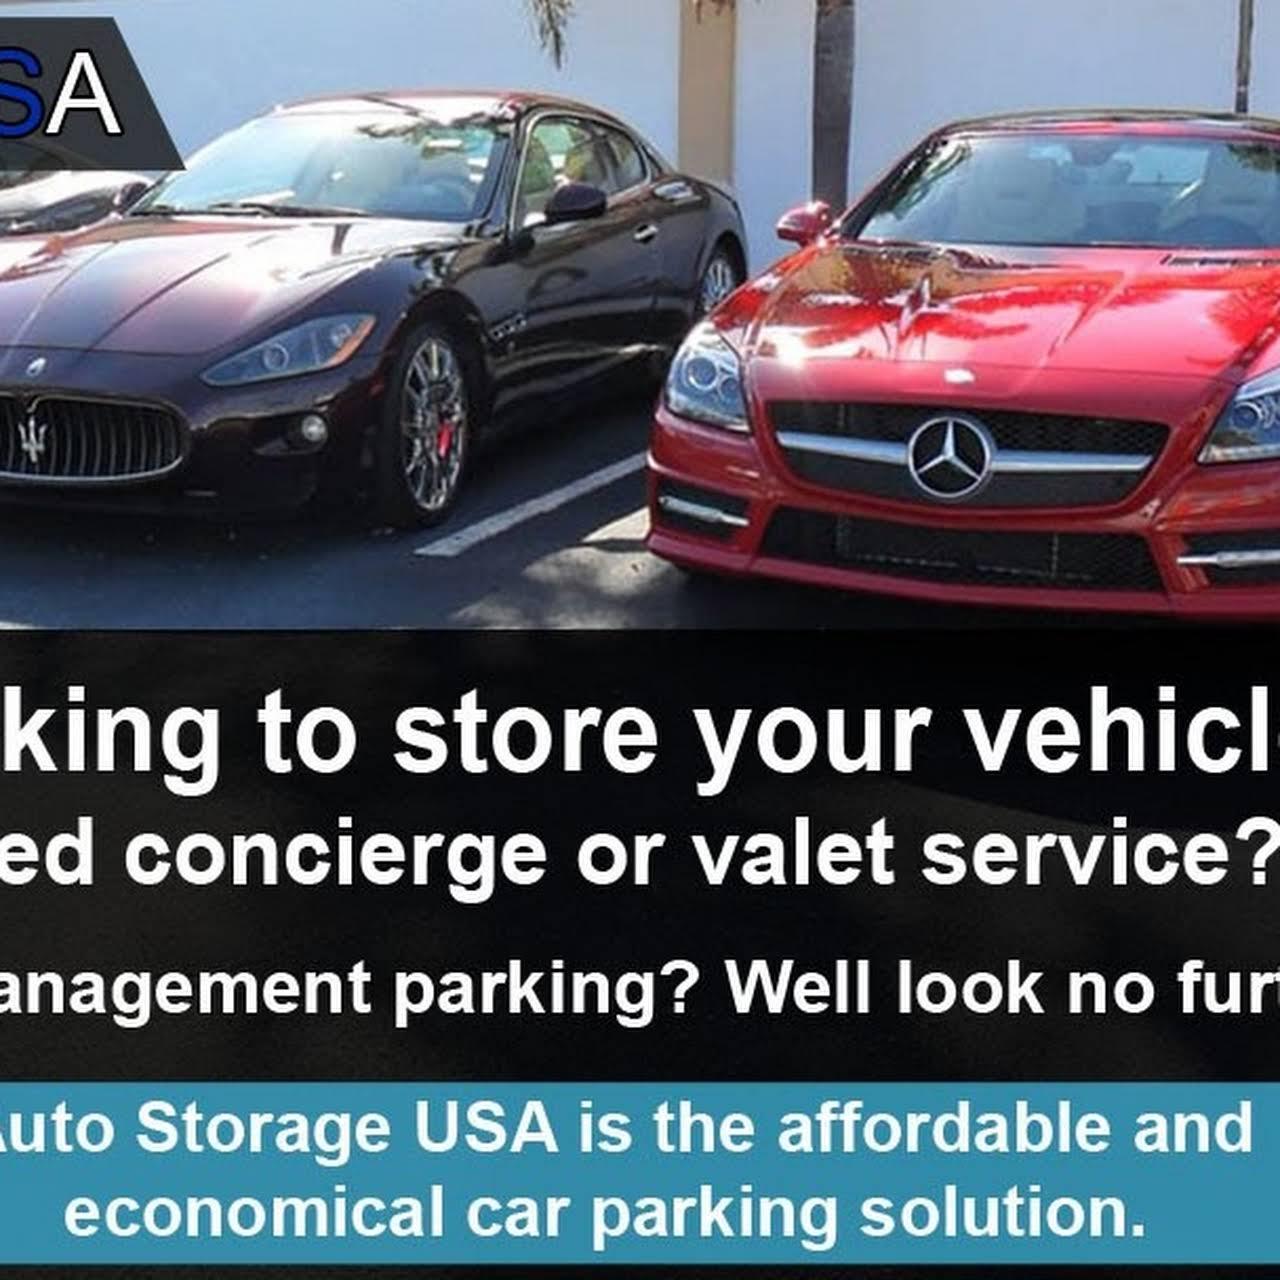 Auto Storage USA - Affordable long term private automobile storage